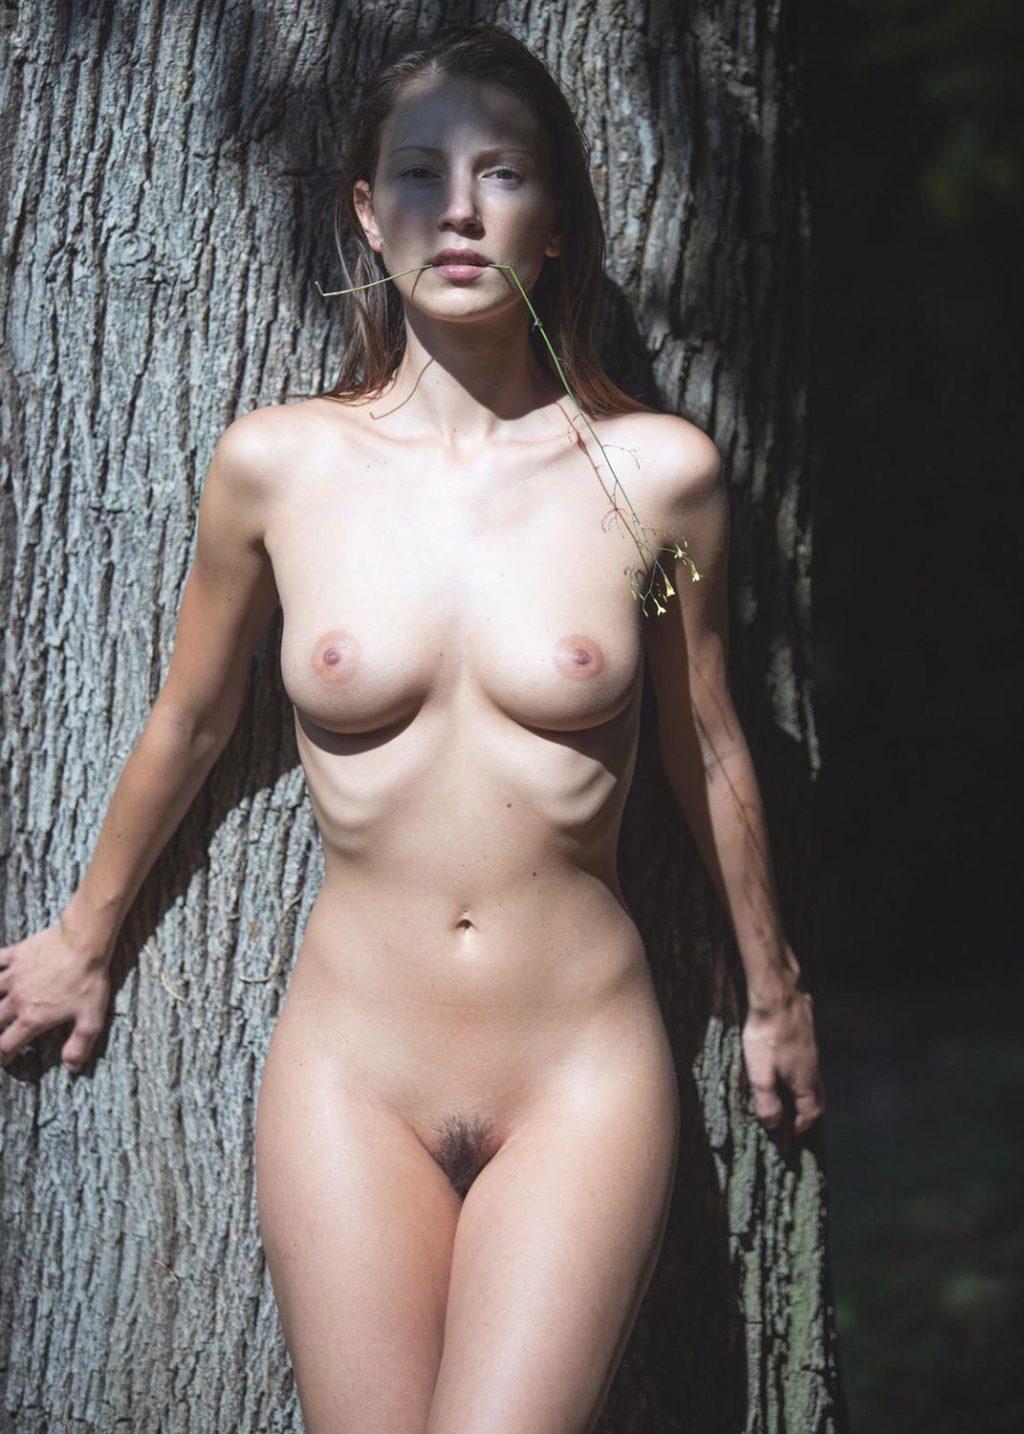 Naked Photos of Miluniel, Nice Tits